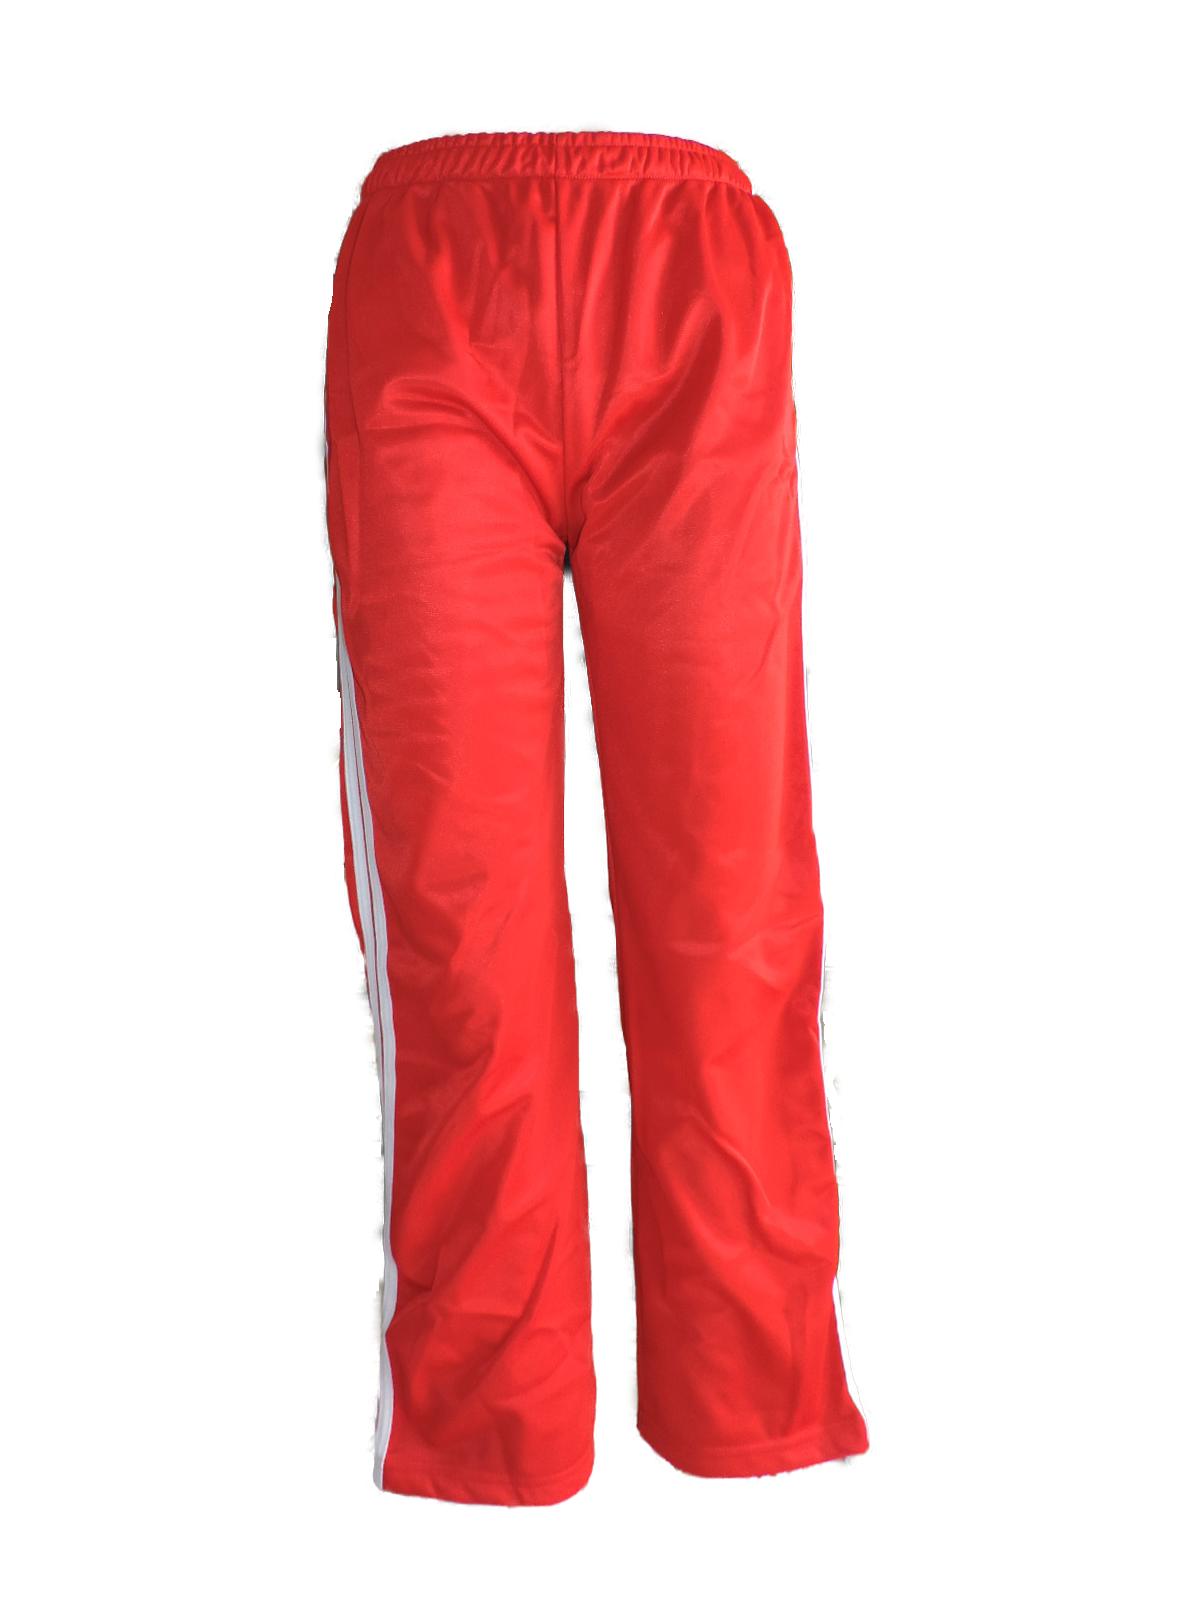 Damen Jogginghose Blau Grau Rot Gr. S M L XL XXL 3XL